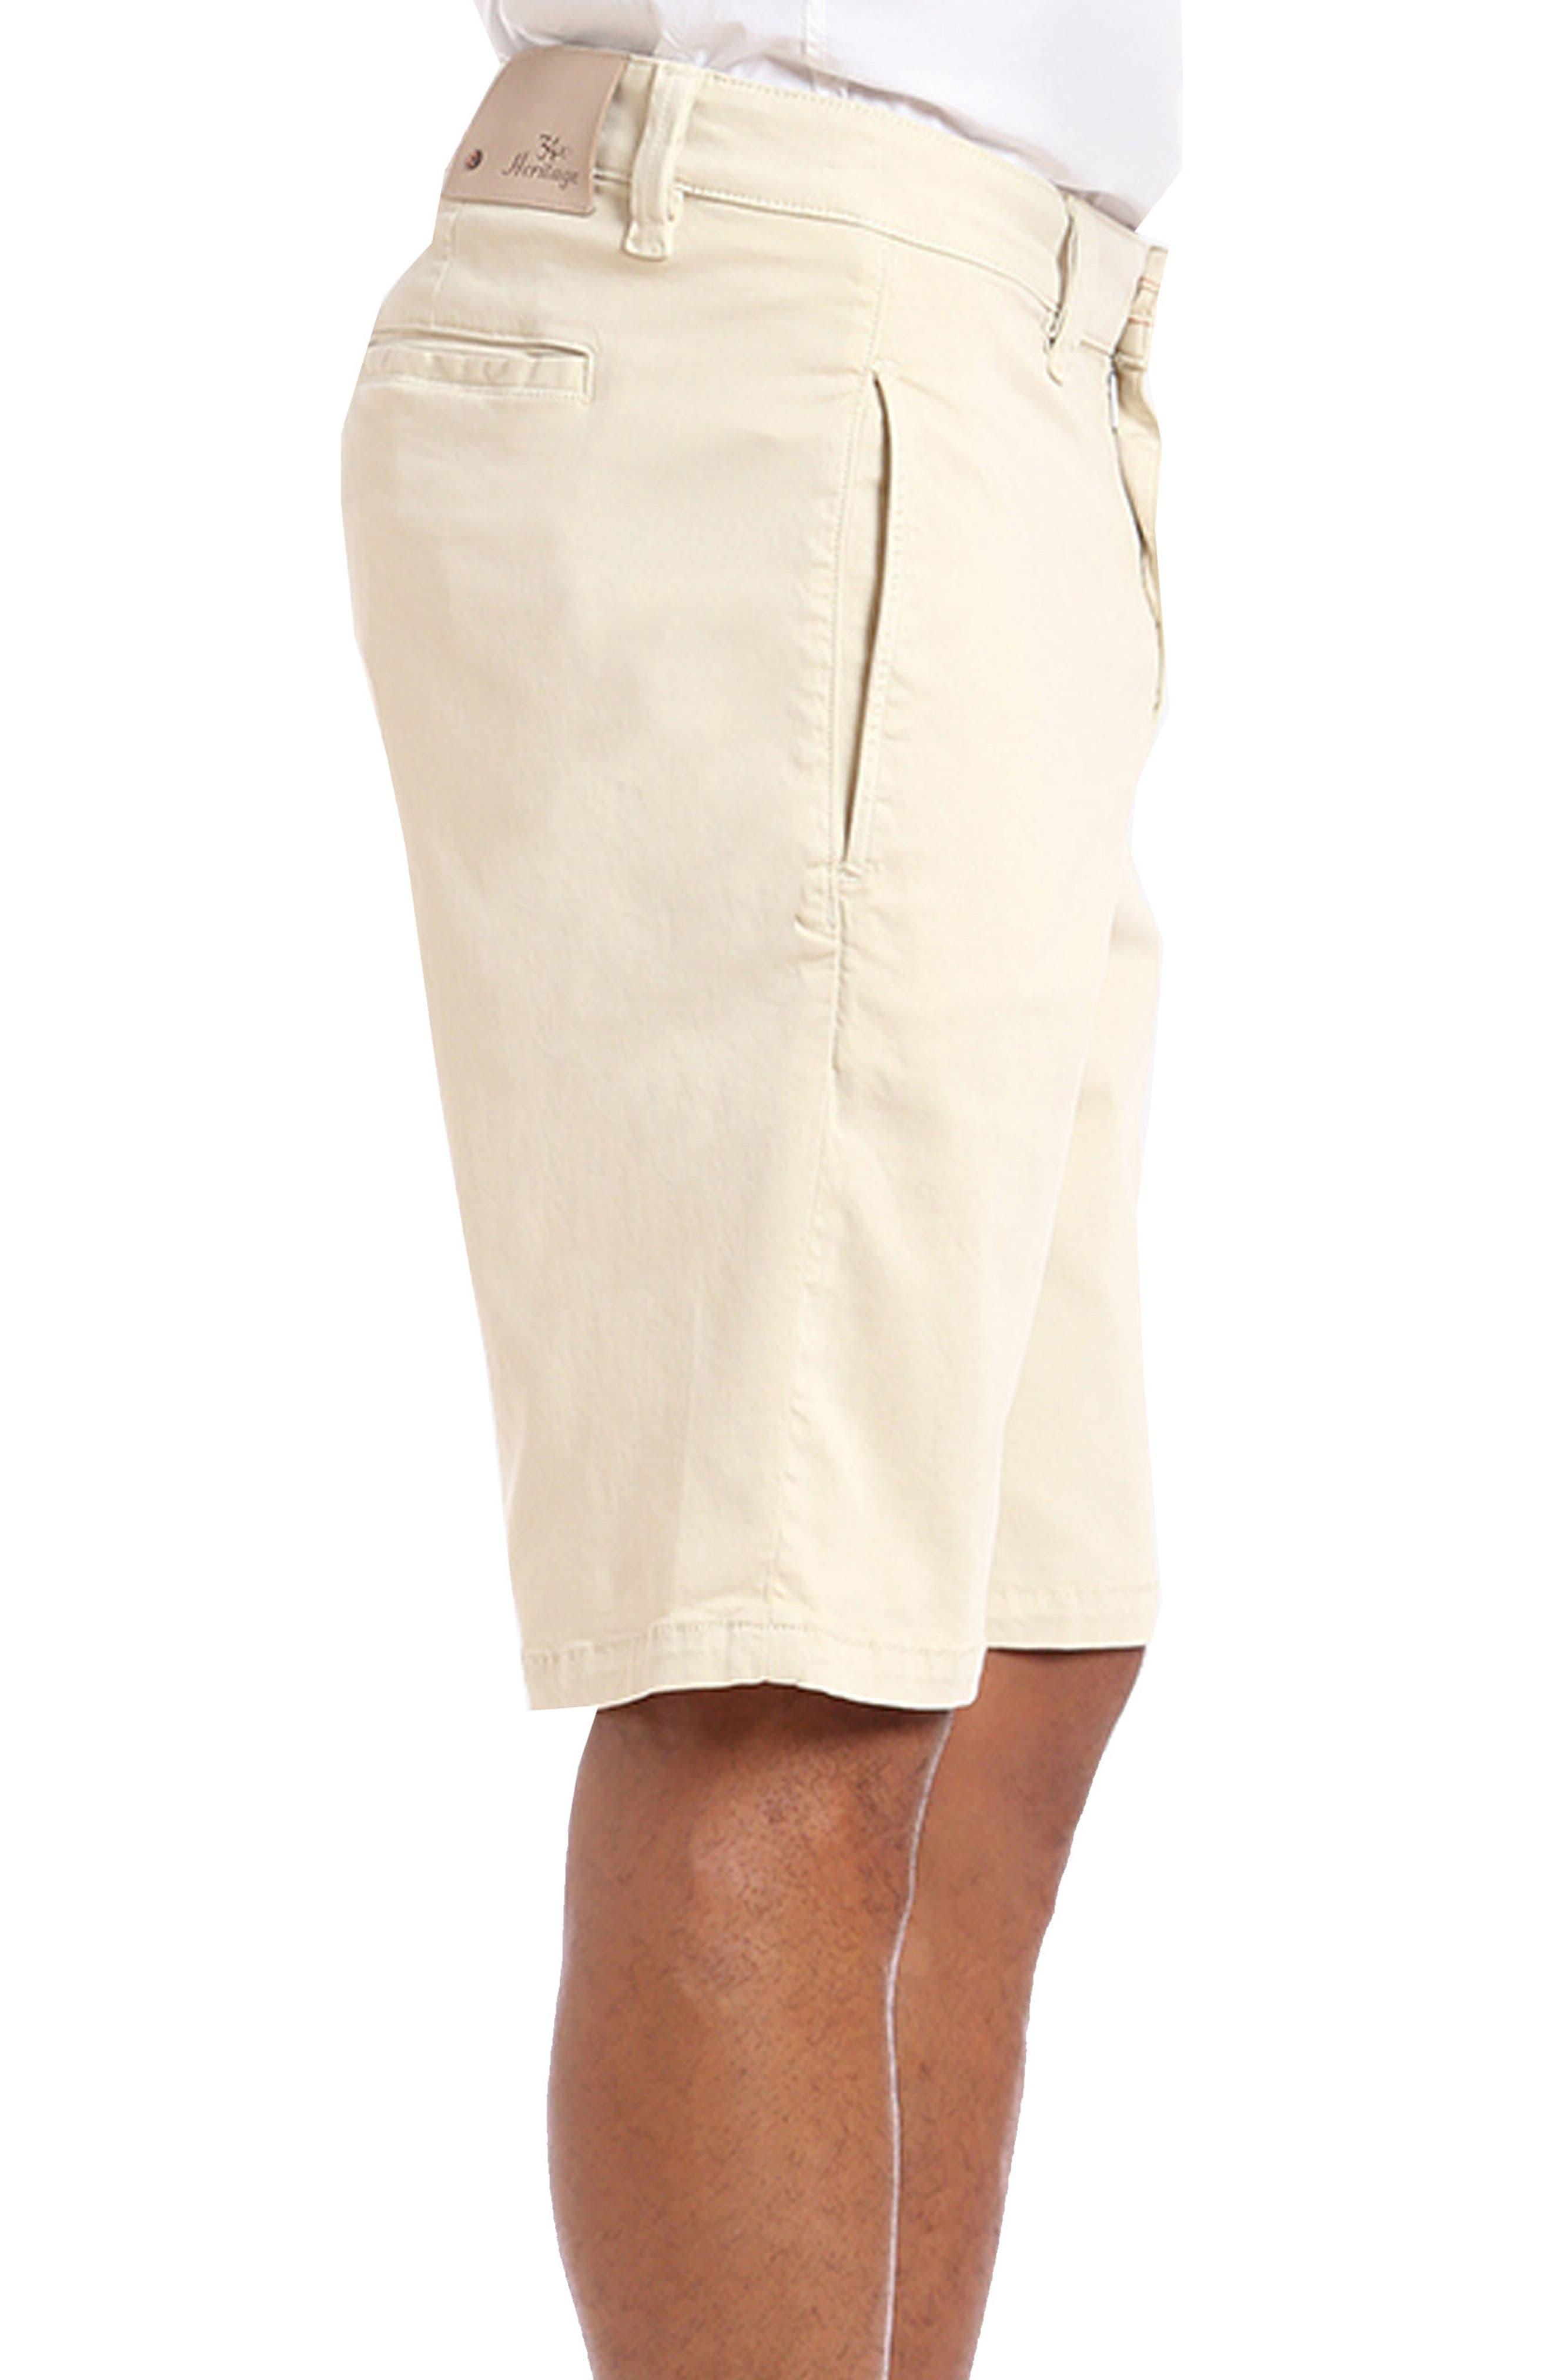 Nevada Twill Shorts,                             Alternate thumbnail 3, color,                             Bone Twill